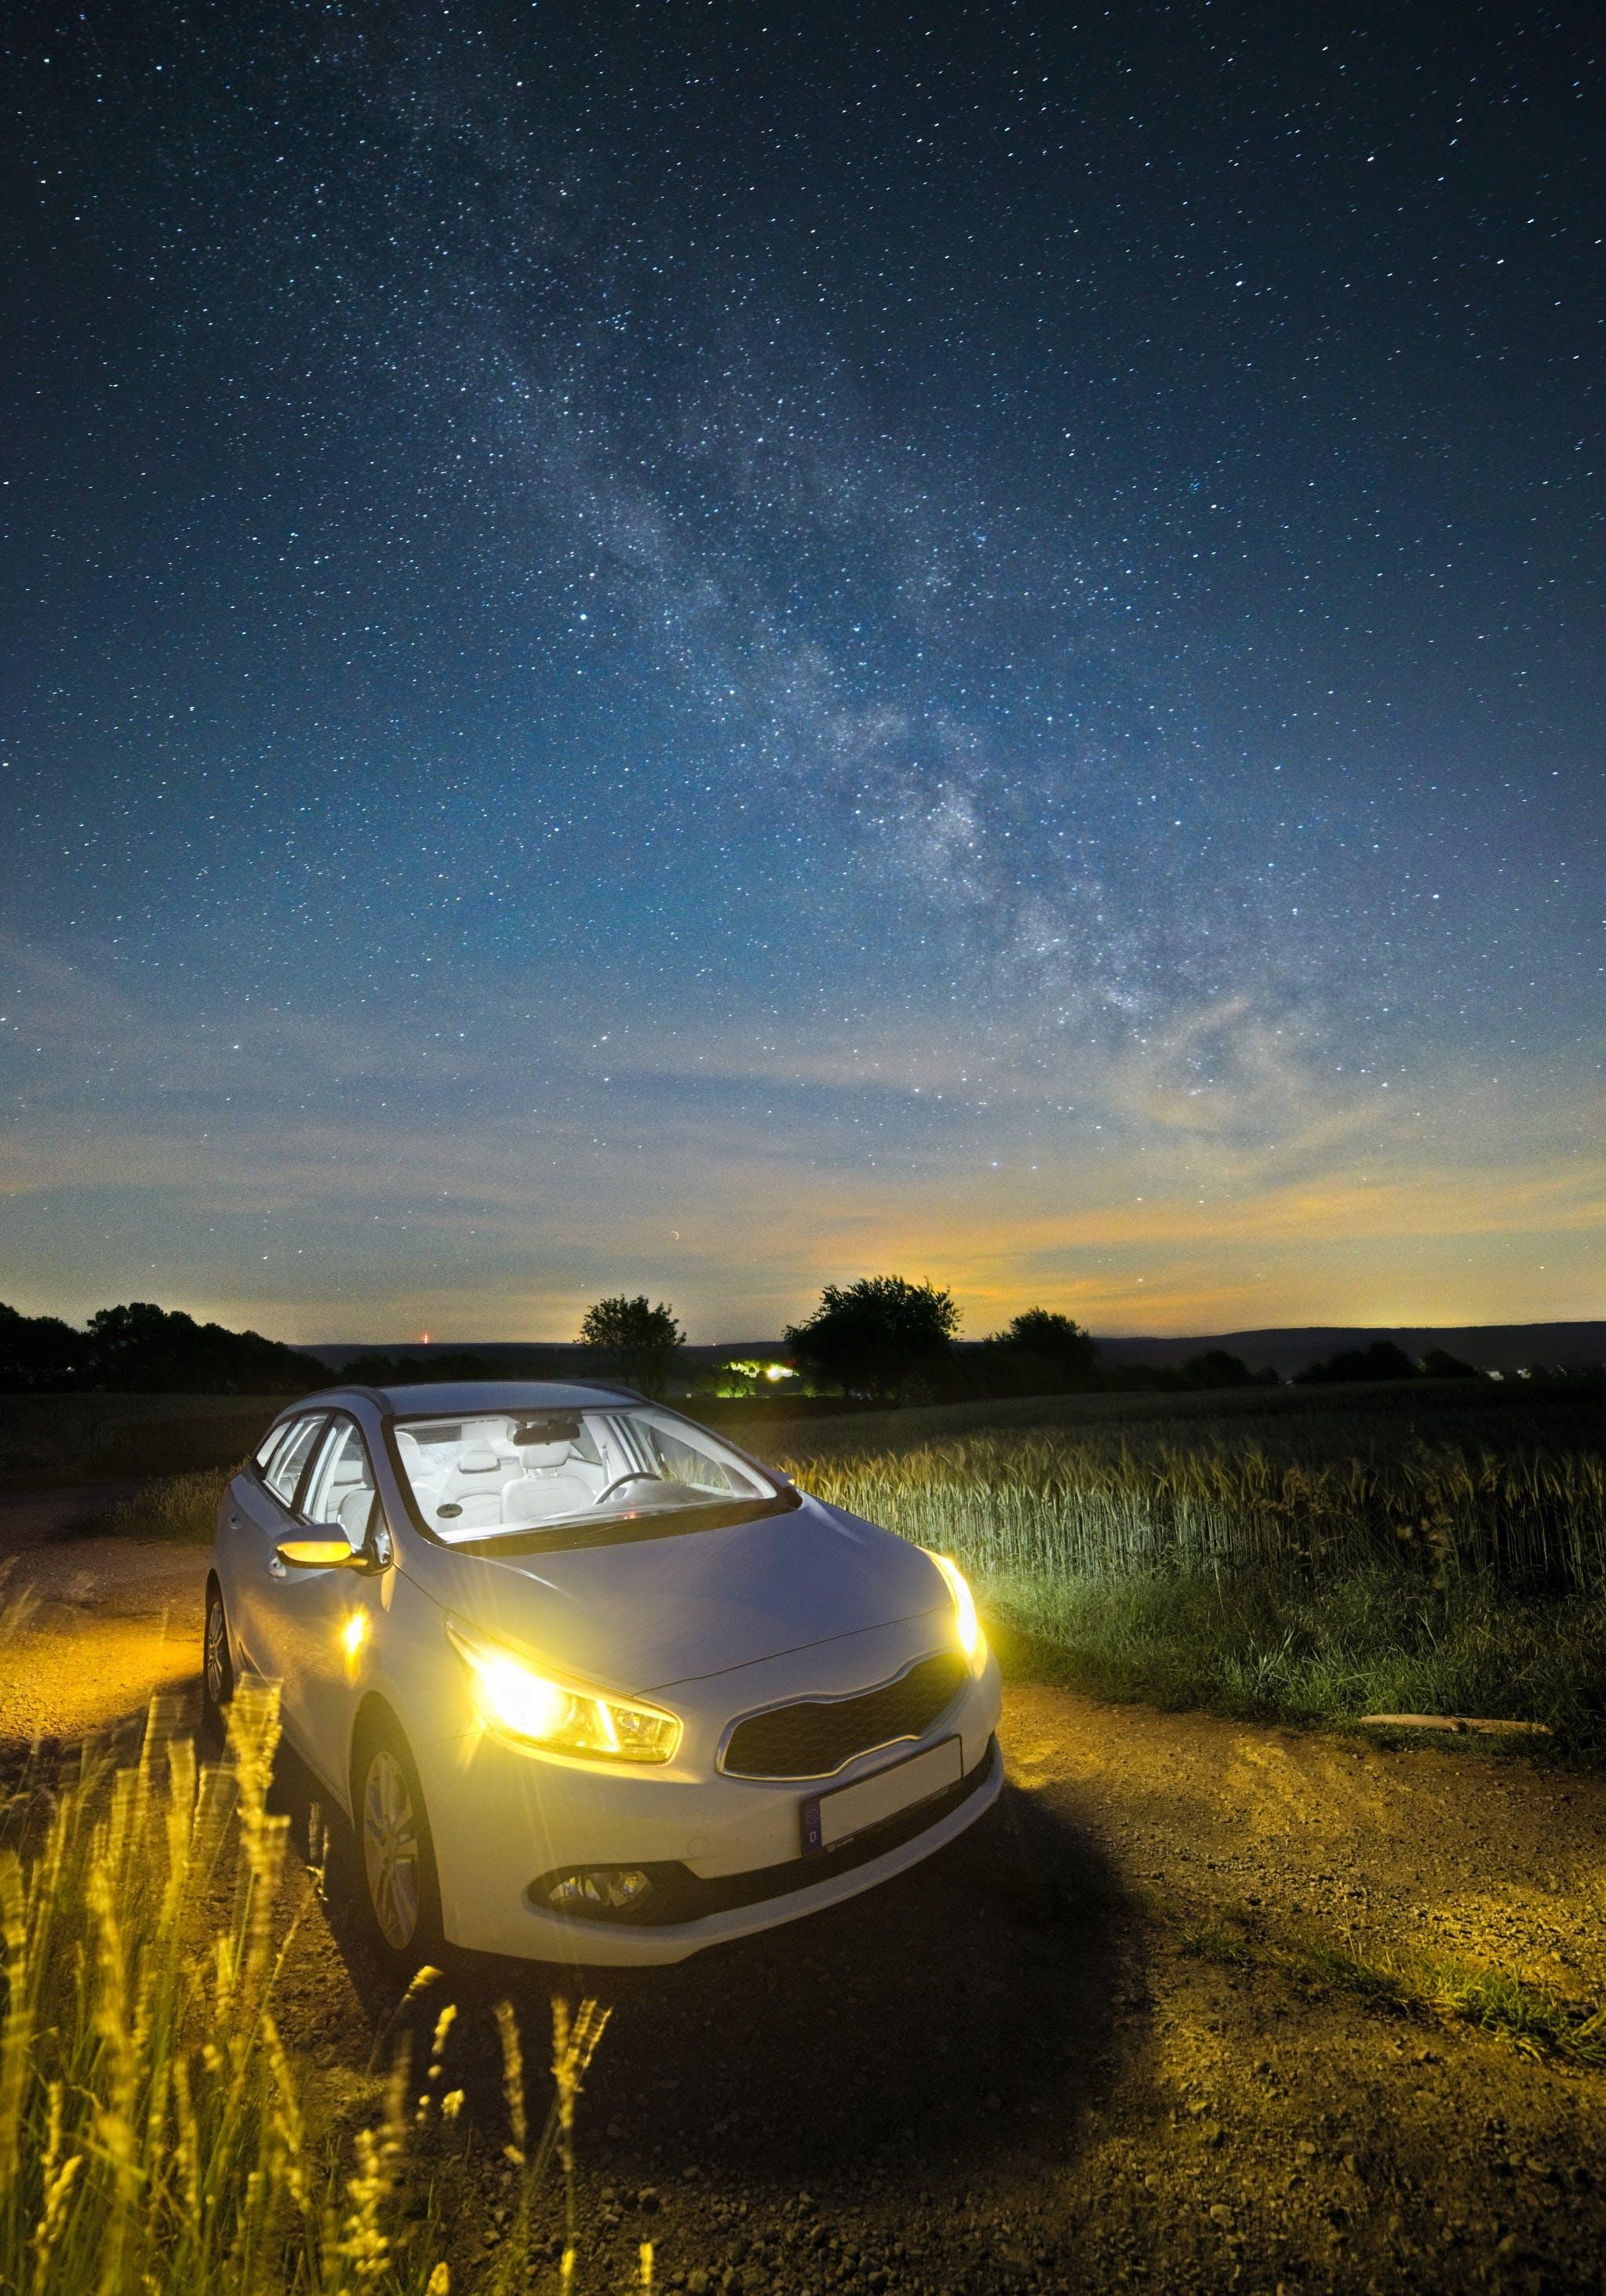 Free stock photo of traffic, sky, lights, night